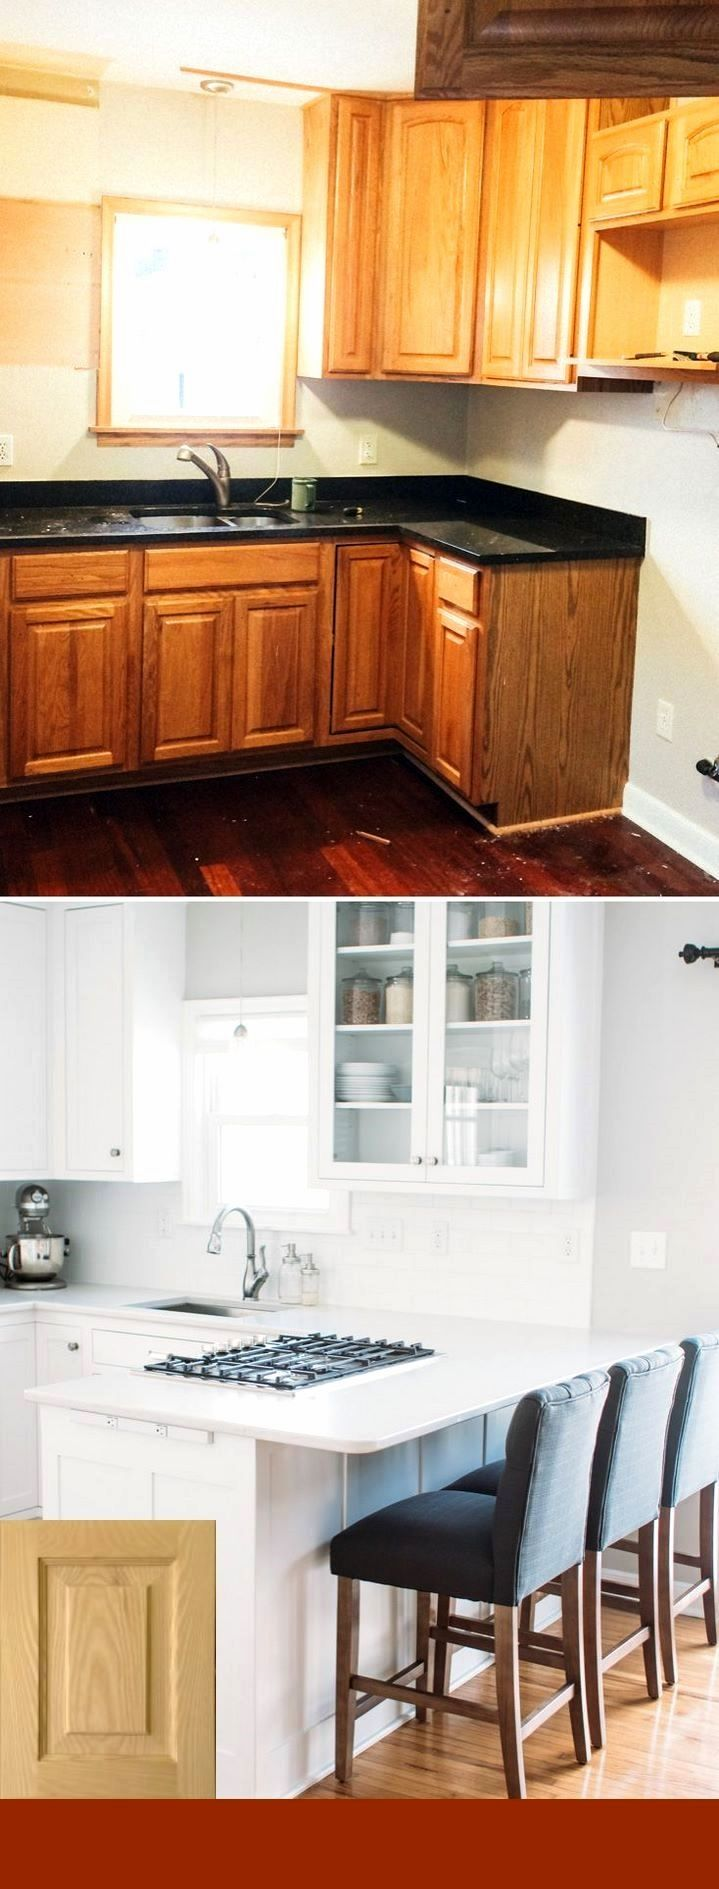 Kitchen Update On A Budget Ideas kitchenremodeling  ...